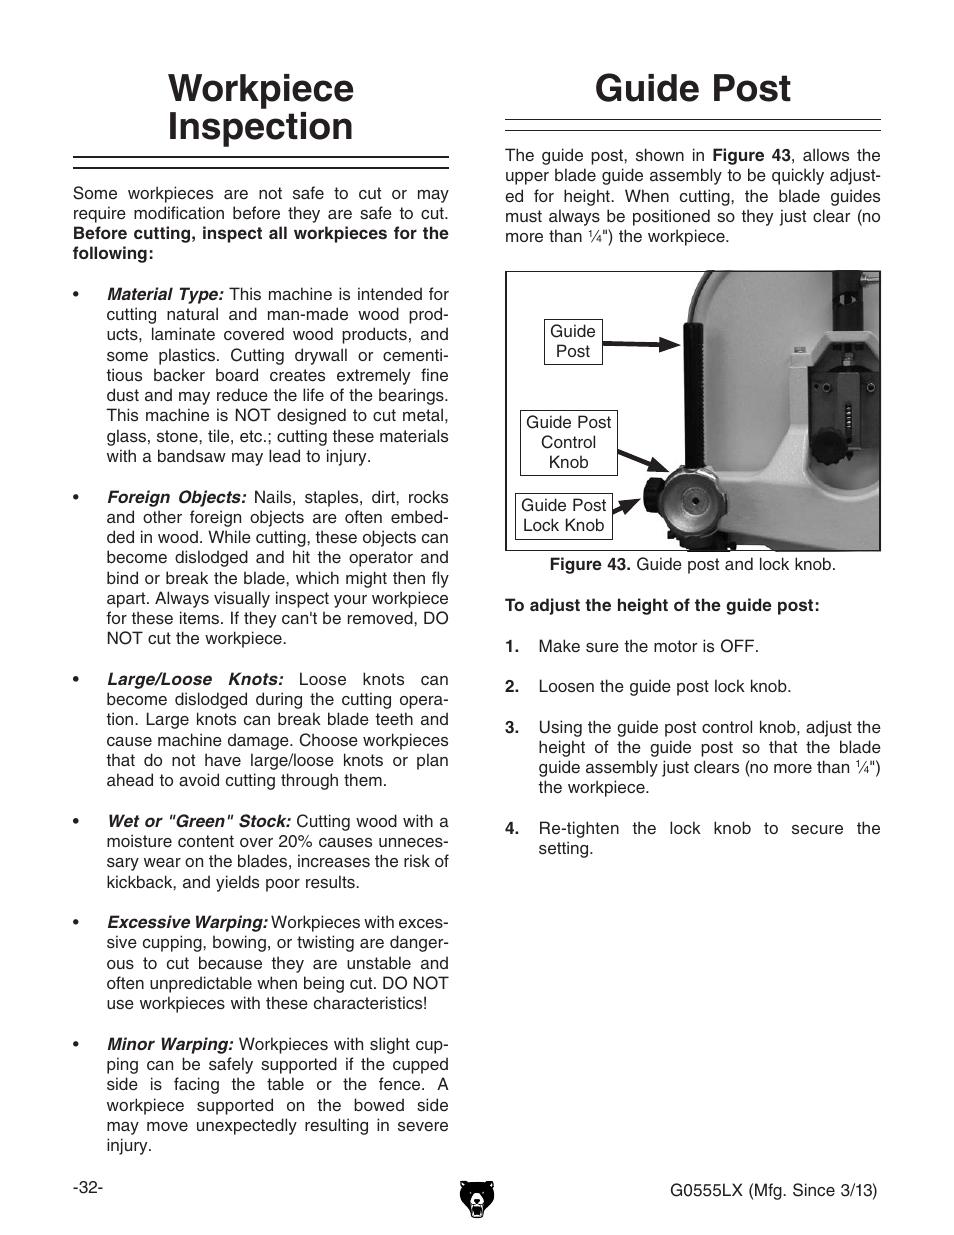 The Inspectors Blog Manual Guide